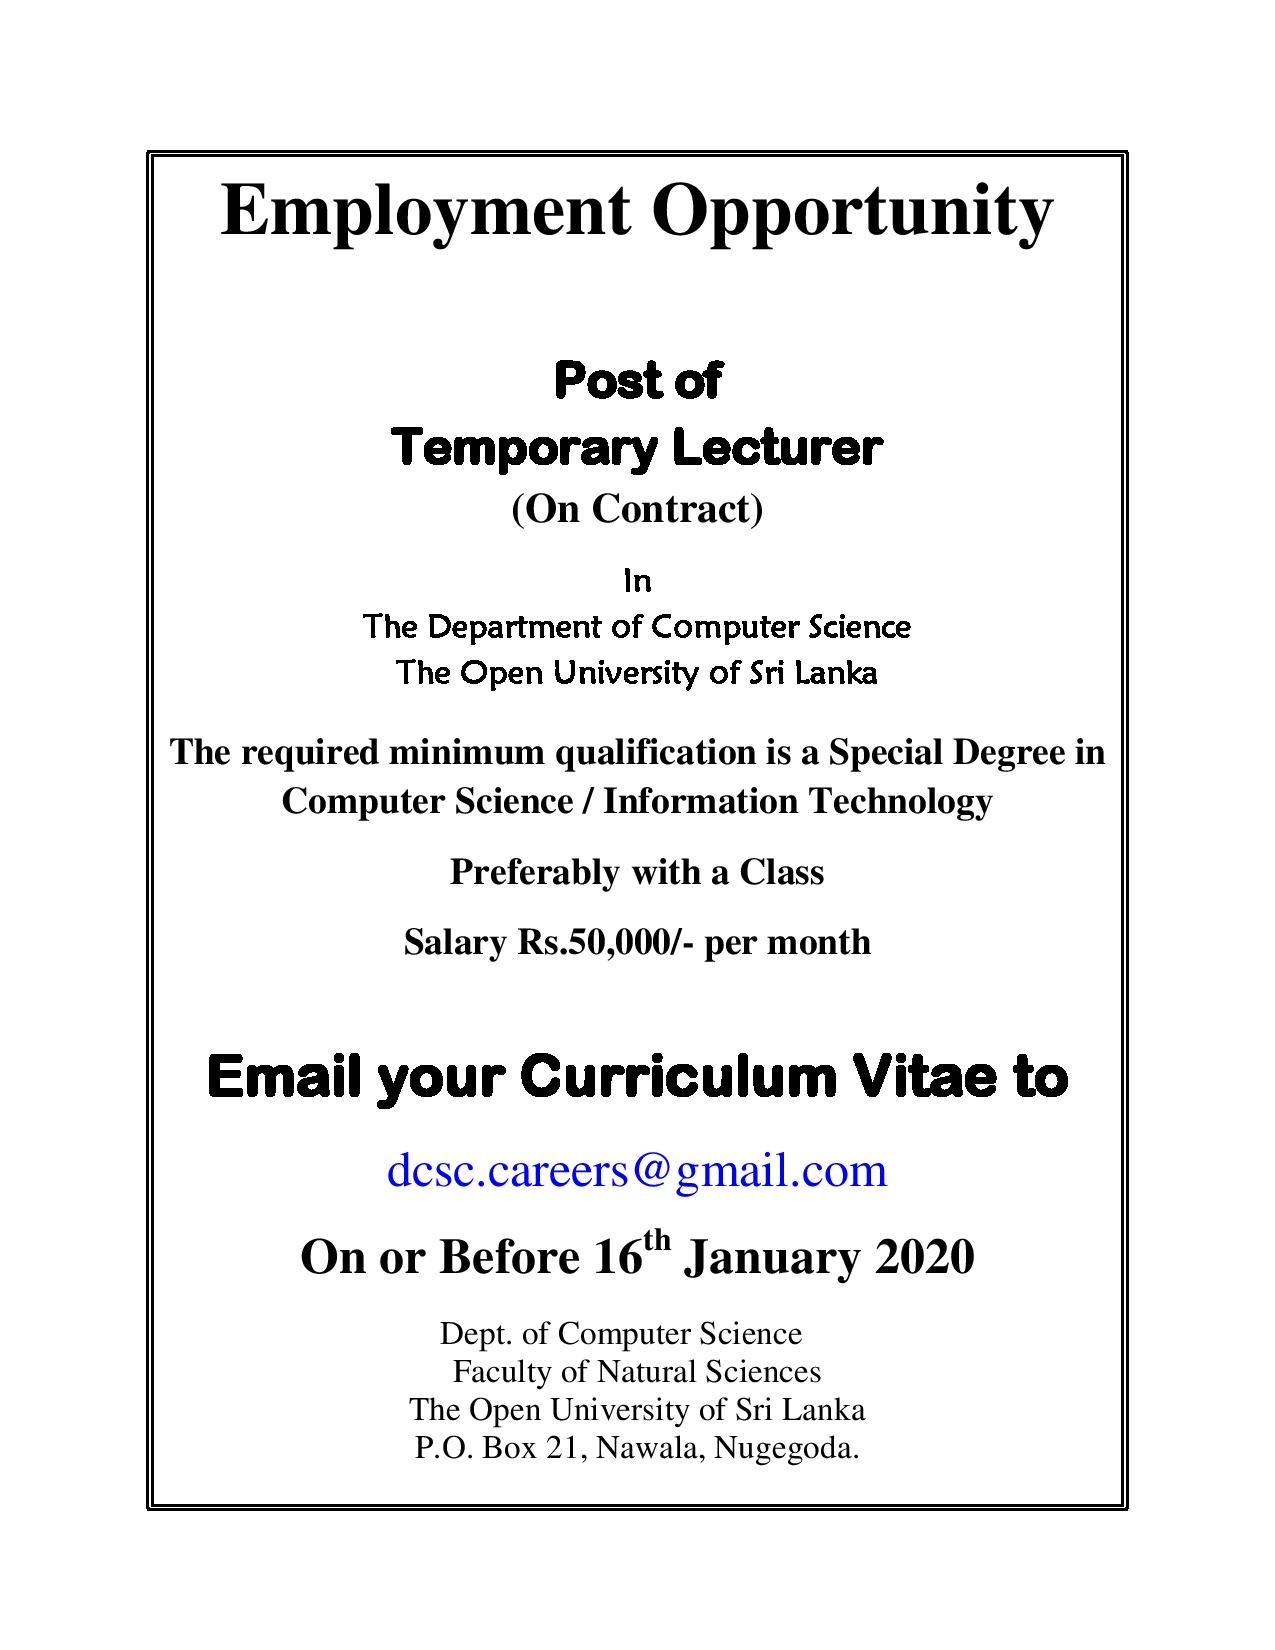 Temporary Lecture – The Open University Of Sri Lanka